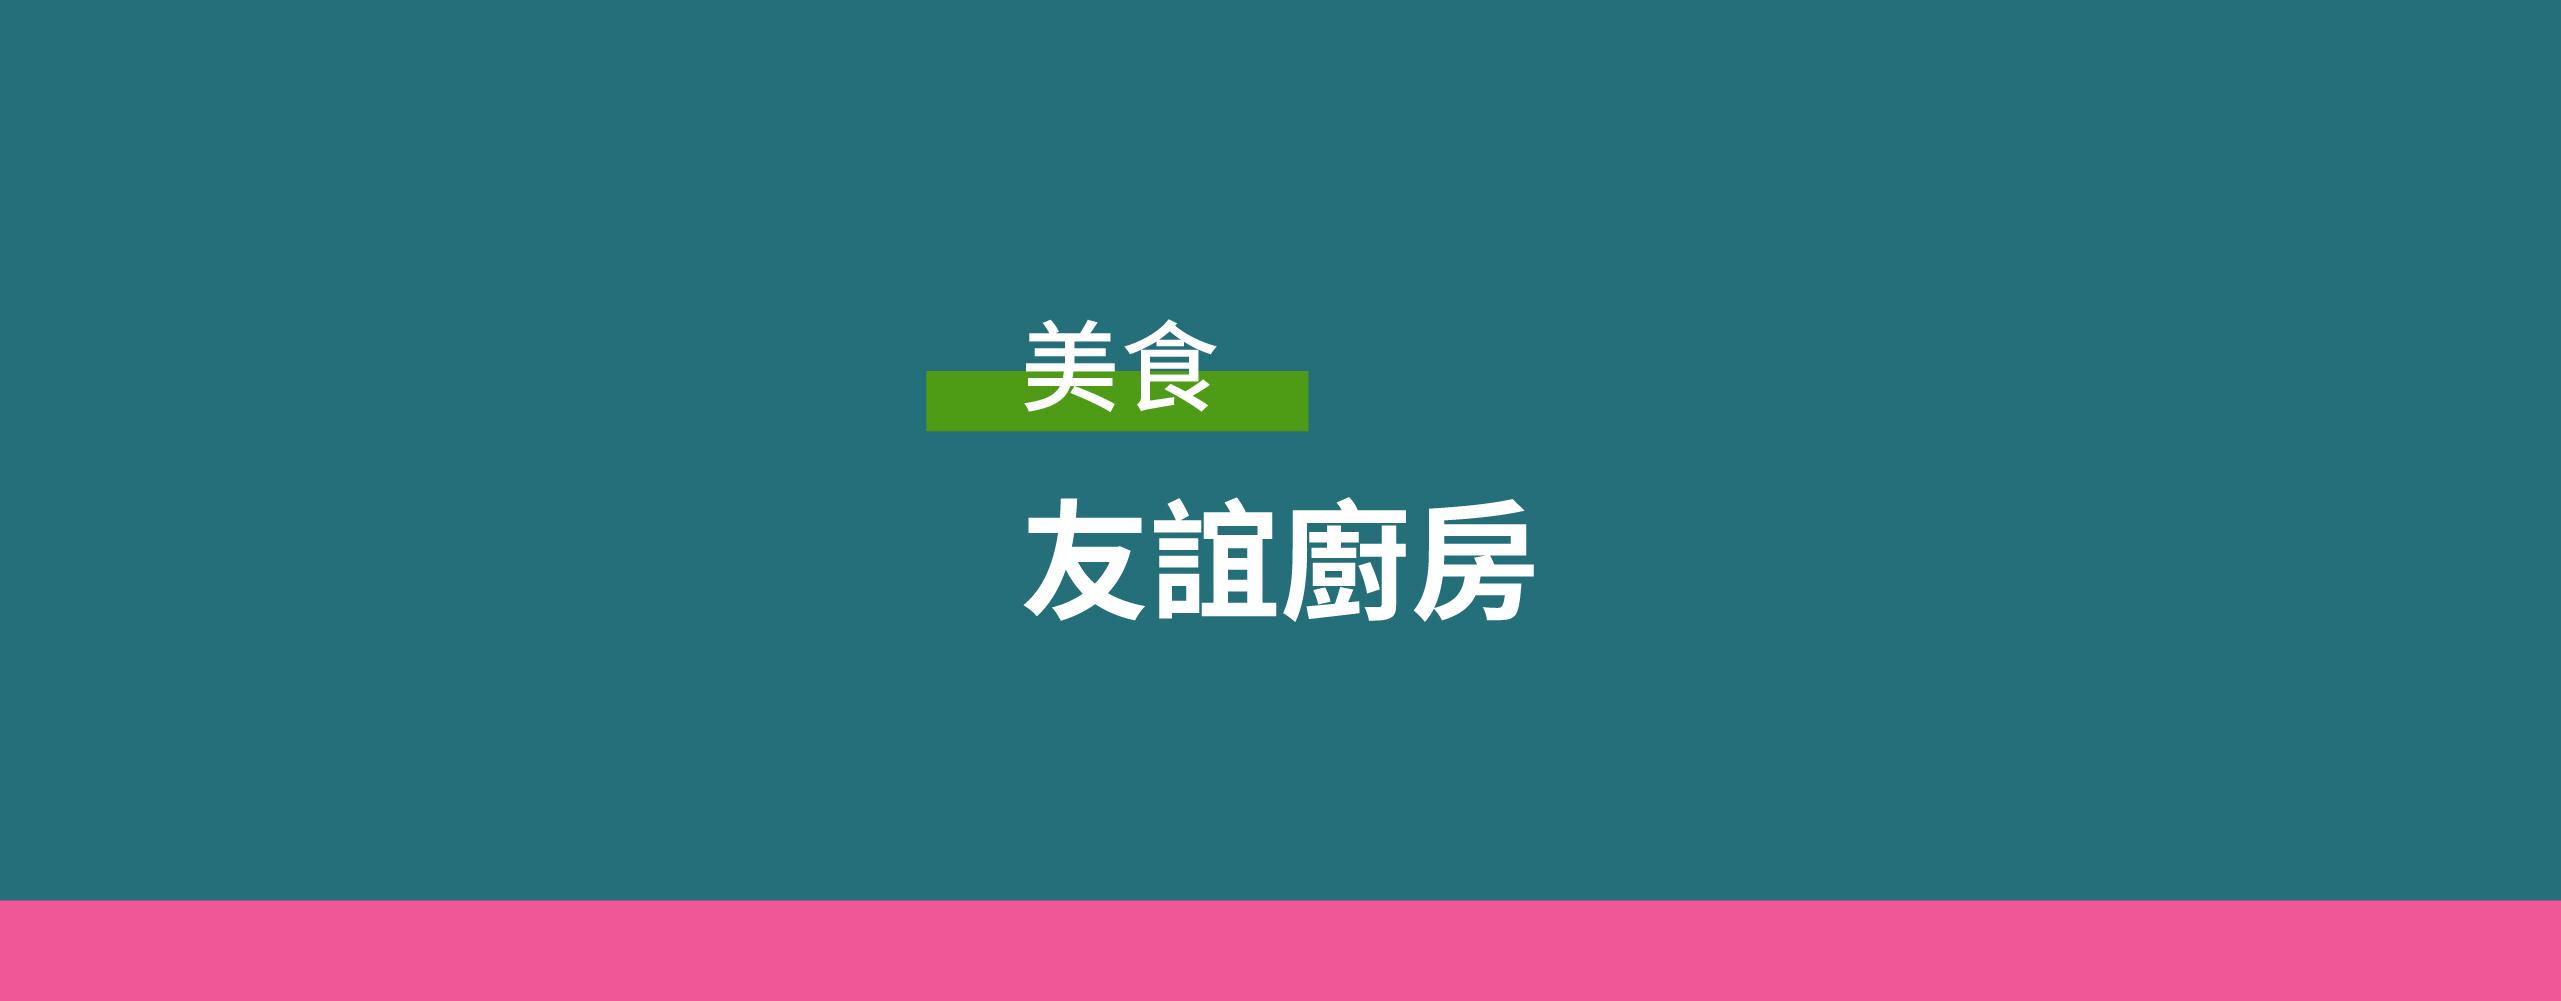 TAIWANfest Letterhead - Kitchen